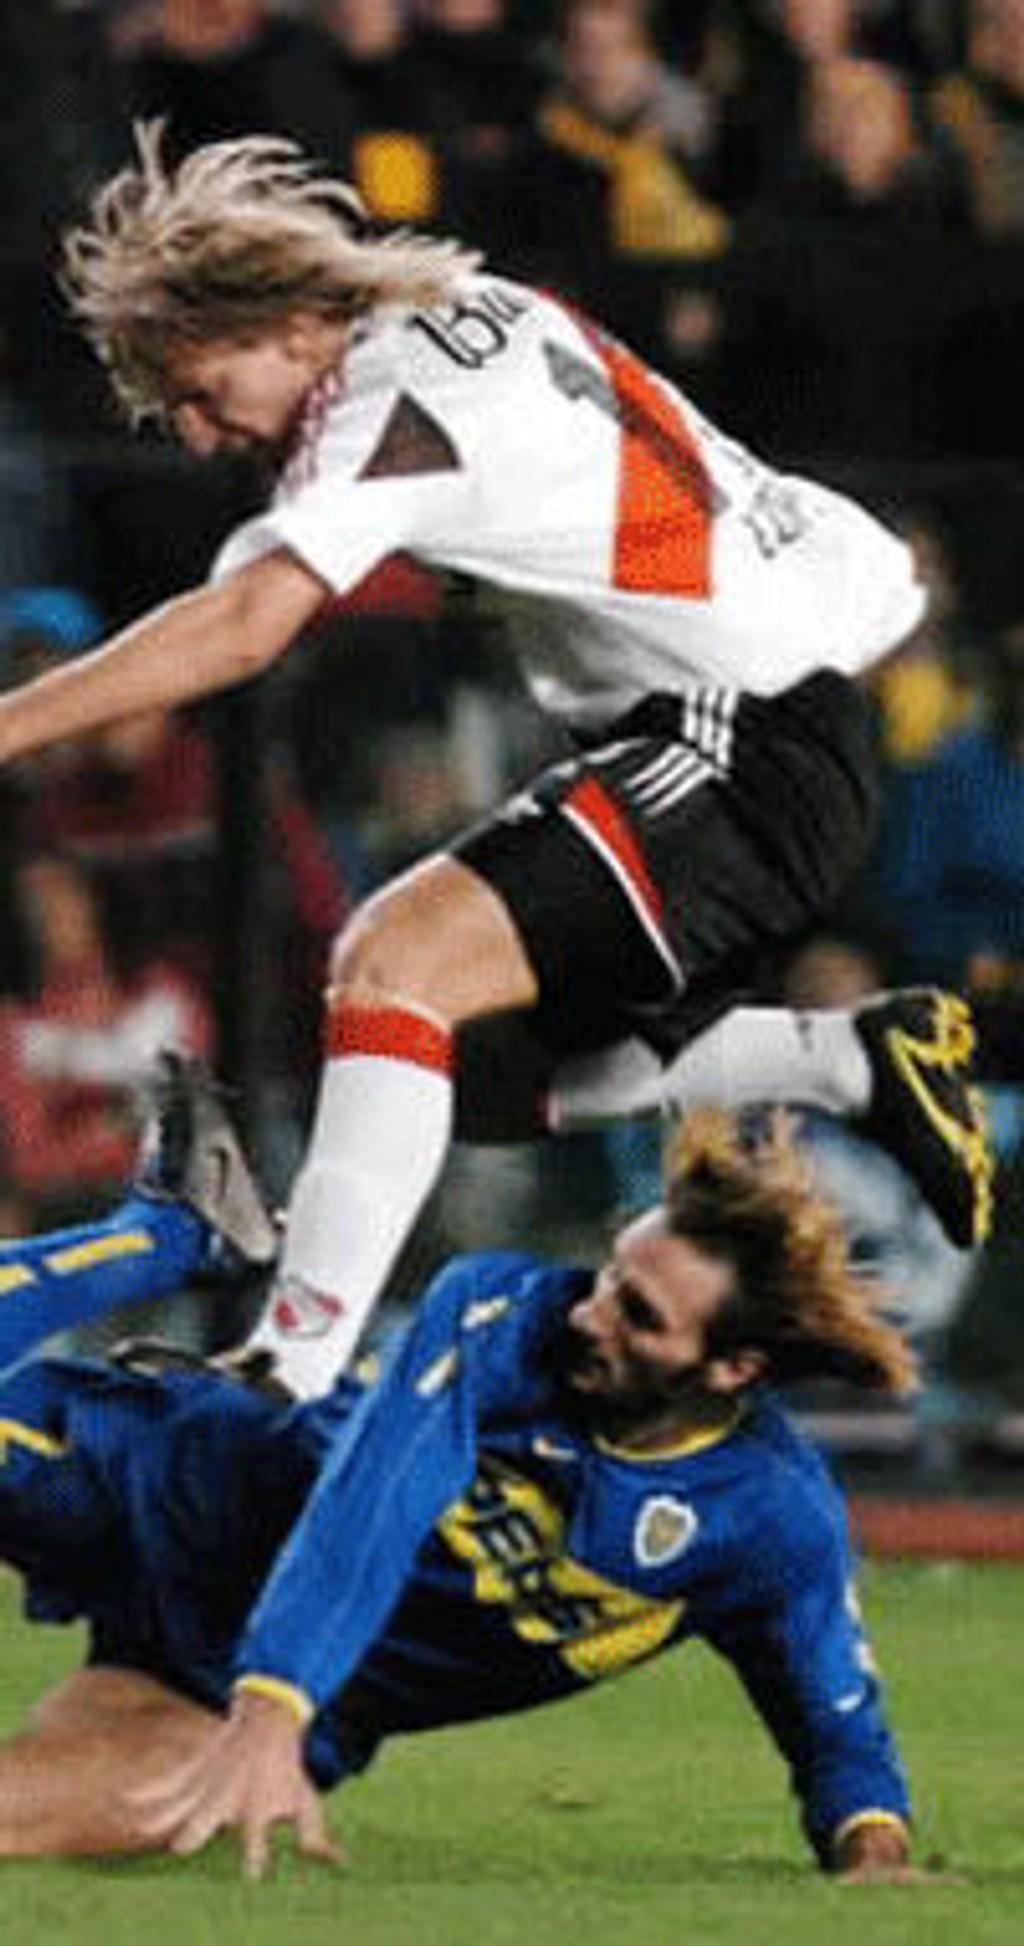 River Plates Maxi Lopez (øverst) i duell med Boca Juniors Rolando Schiavi.